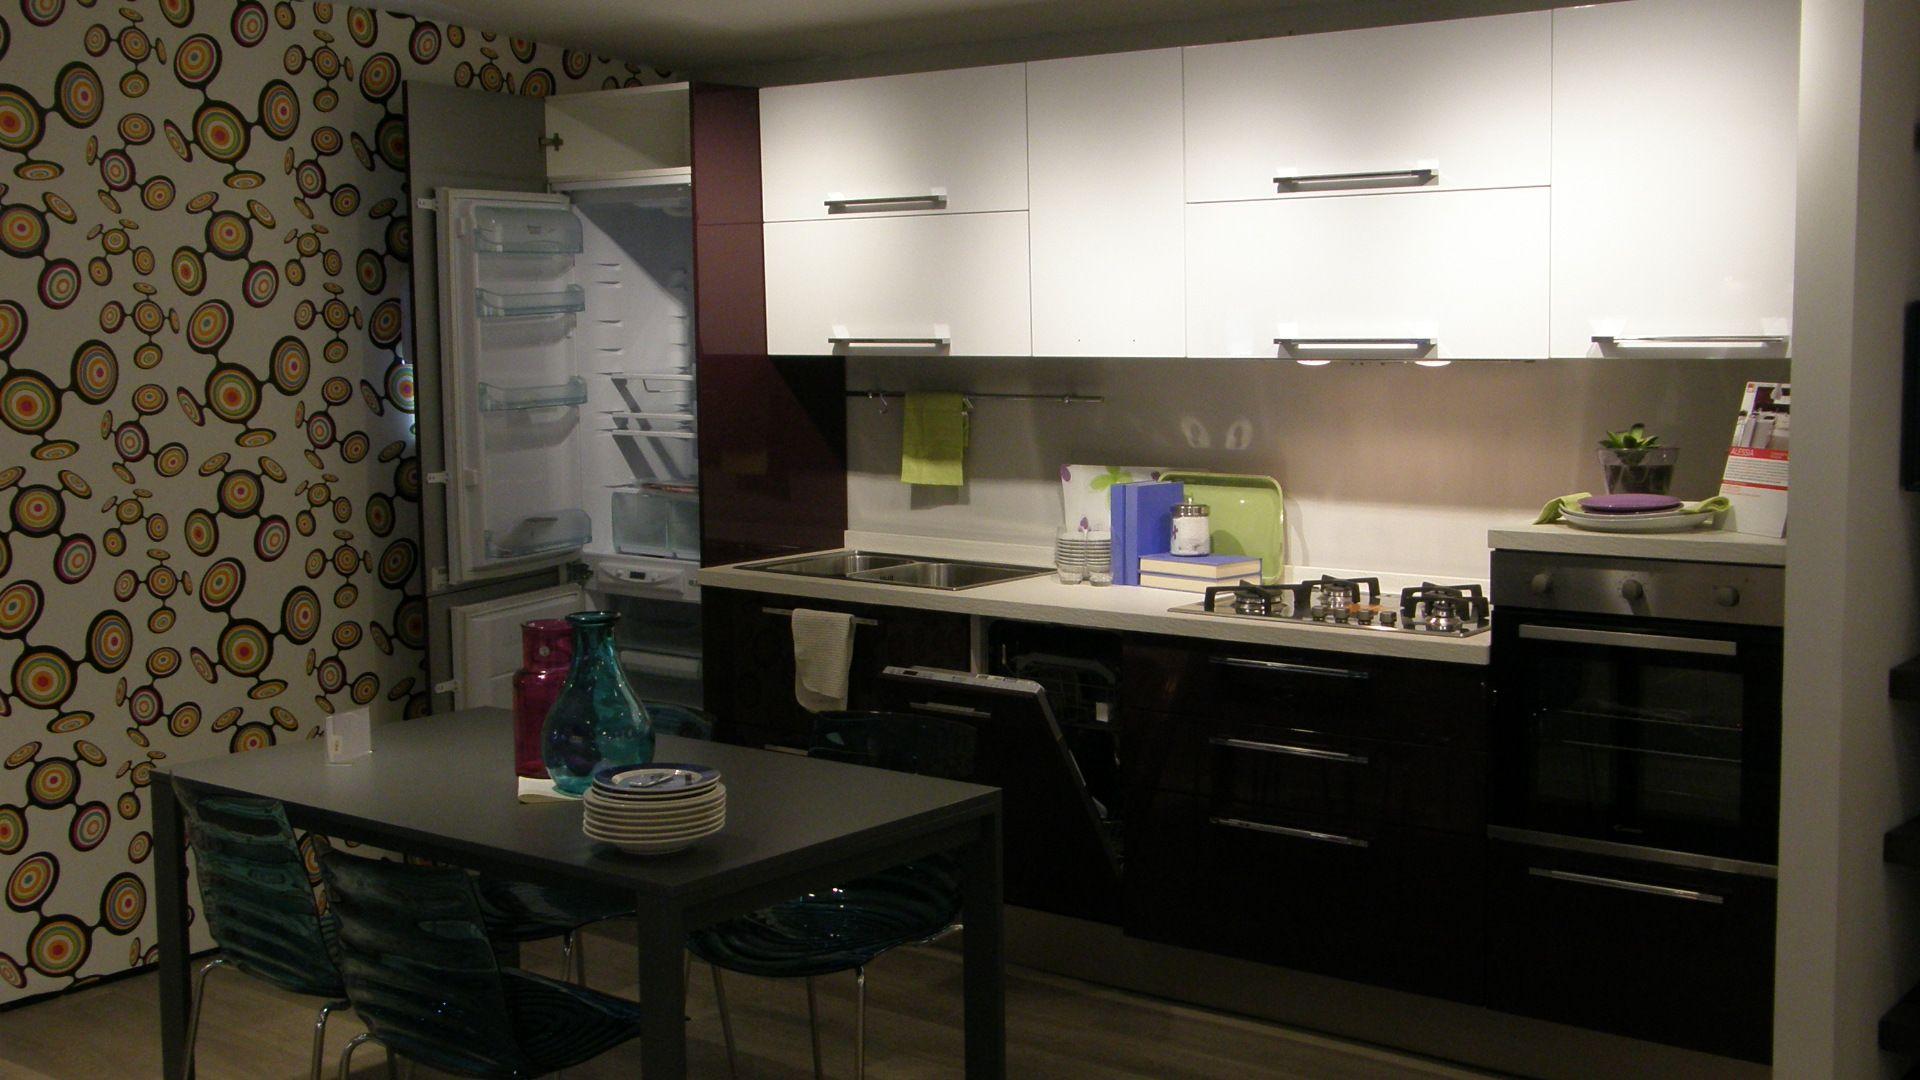 Cucina LUBE Alessia Sconto Outlet 50 | Cucine, Cucine ...